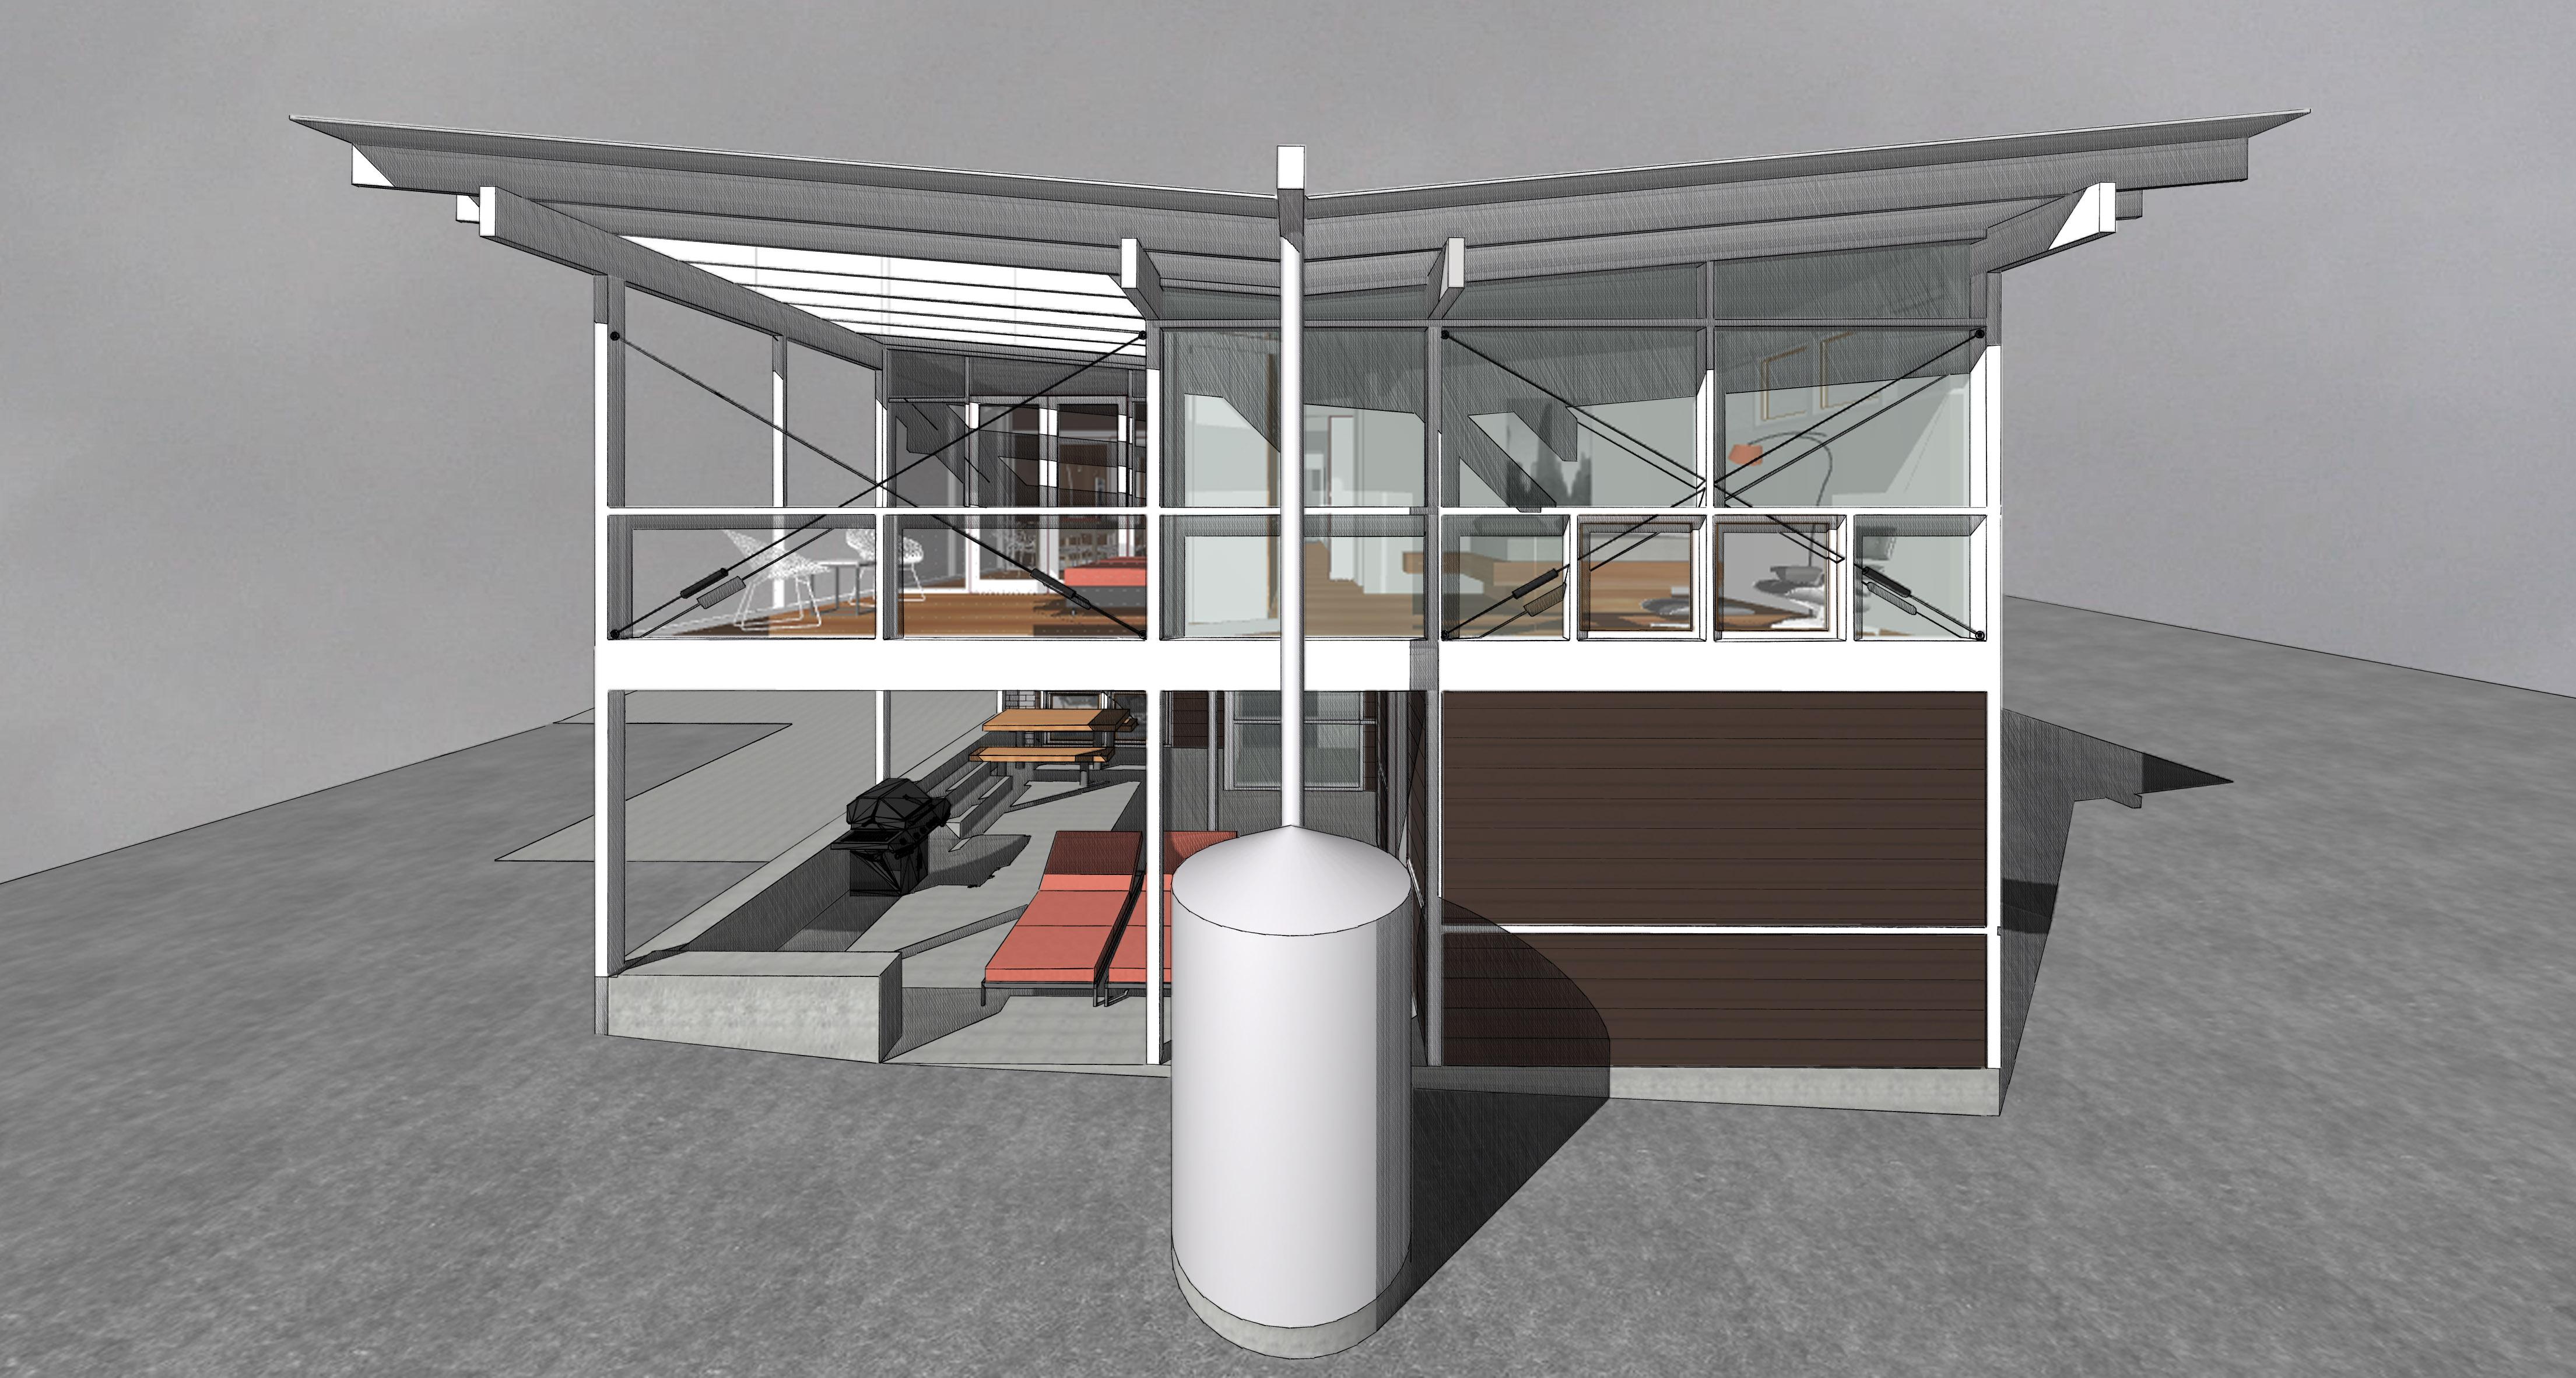 944la residential architect robert cain architect for Atlanta residential architects